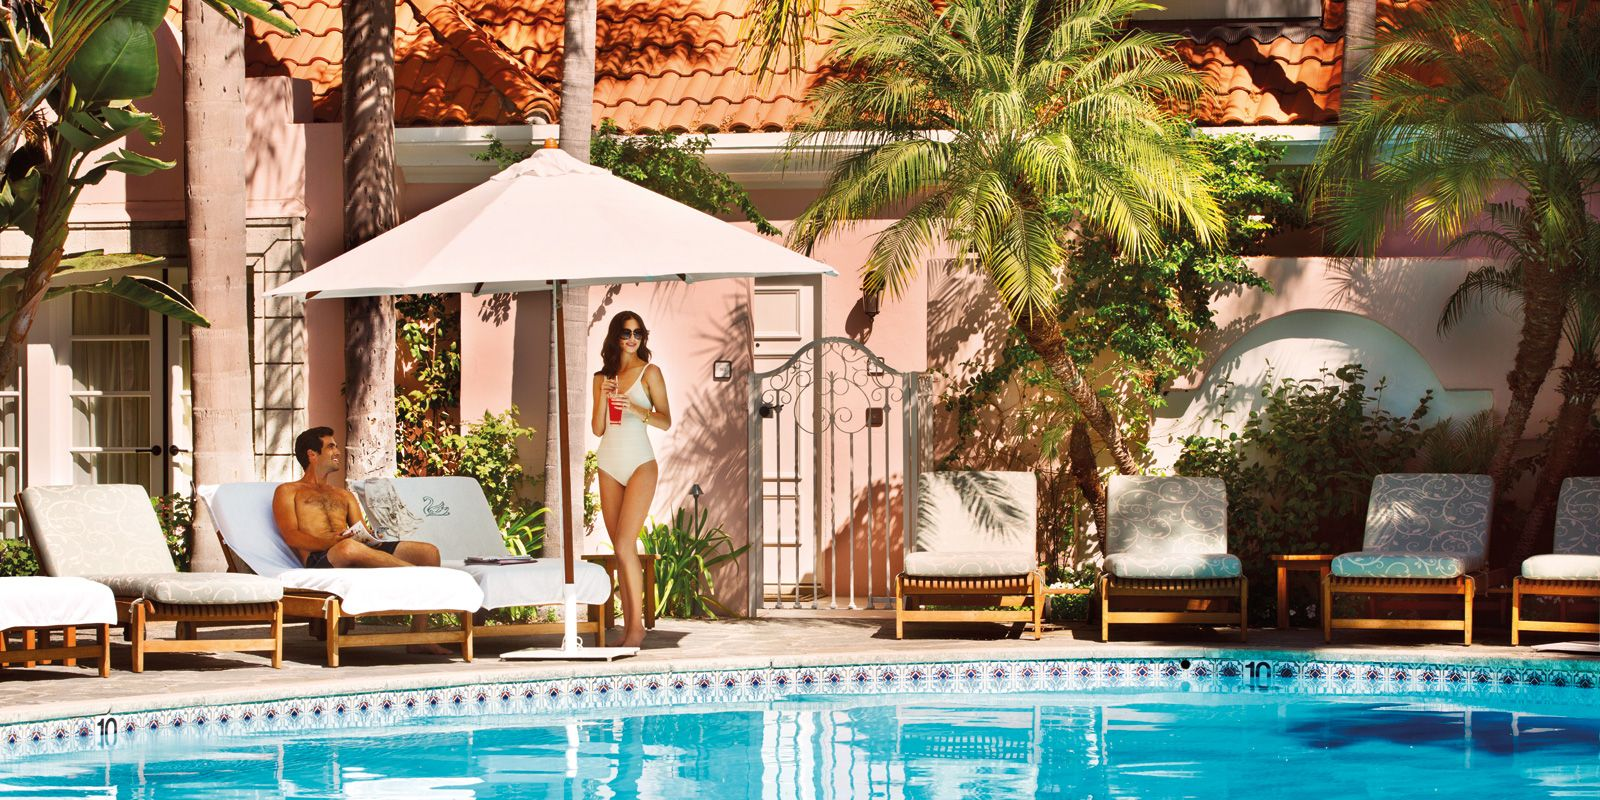 Hotel Bel Air 5 Star Luxury Hotel Hotel Bel Air California